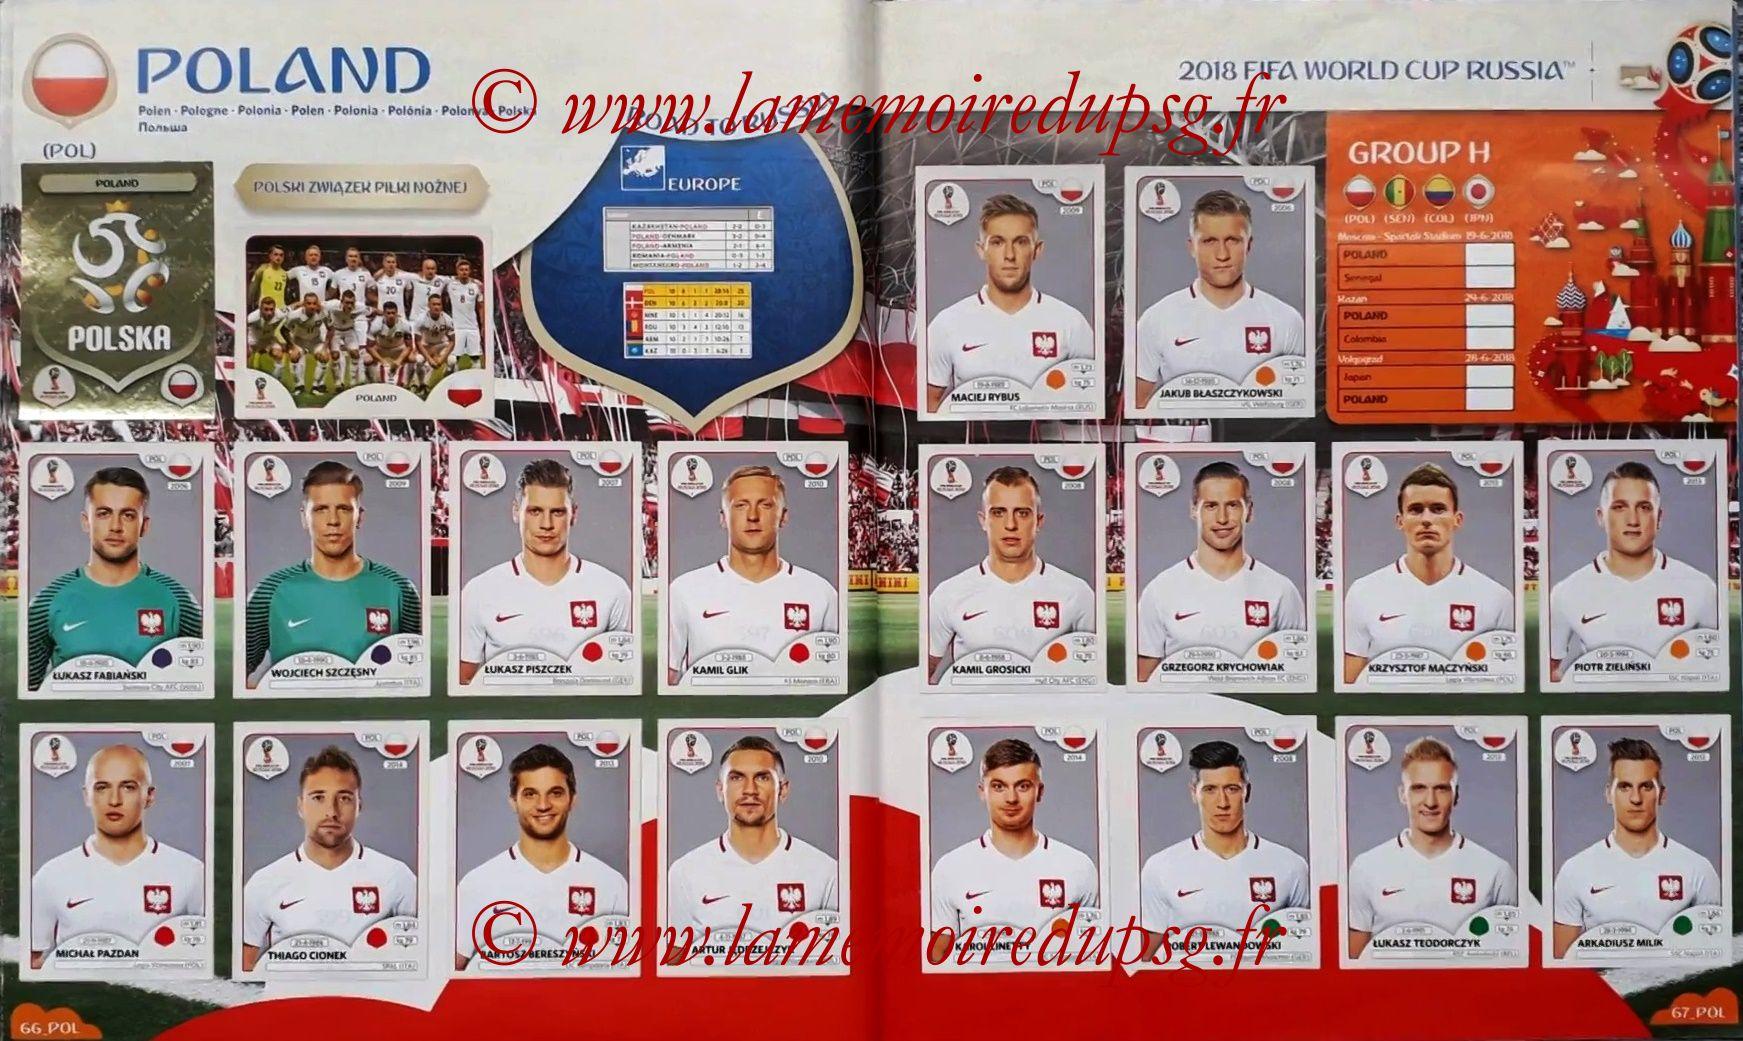 Topps Match Attax SPL Equipo Set Completo De Corazones De 18 tarjetas insignia del equipo de jugador estrella